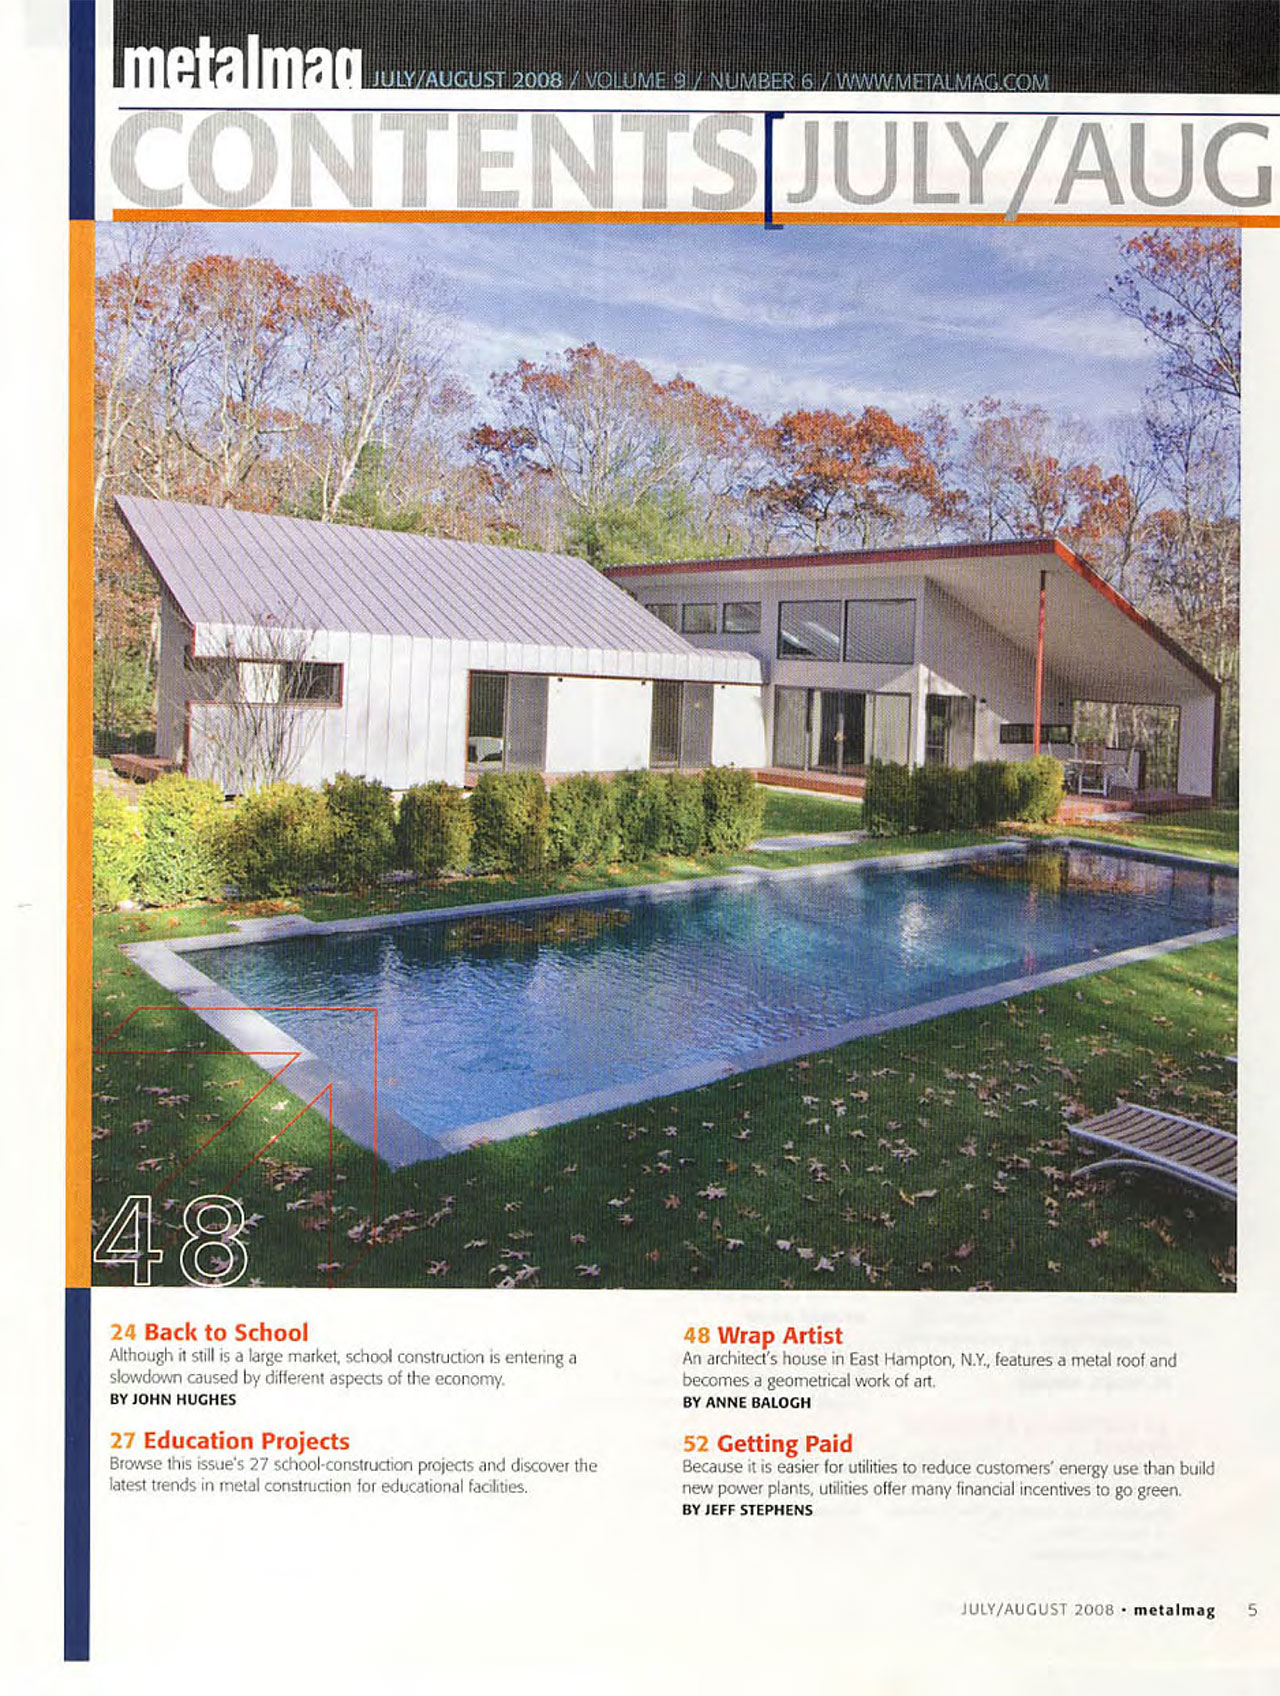 02_News_Metal-Magazine-Whalerock-Lane-02_web_w1280